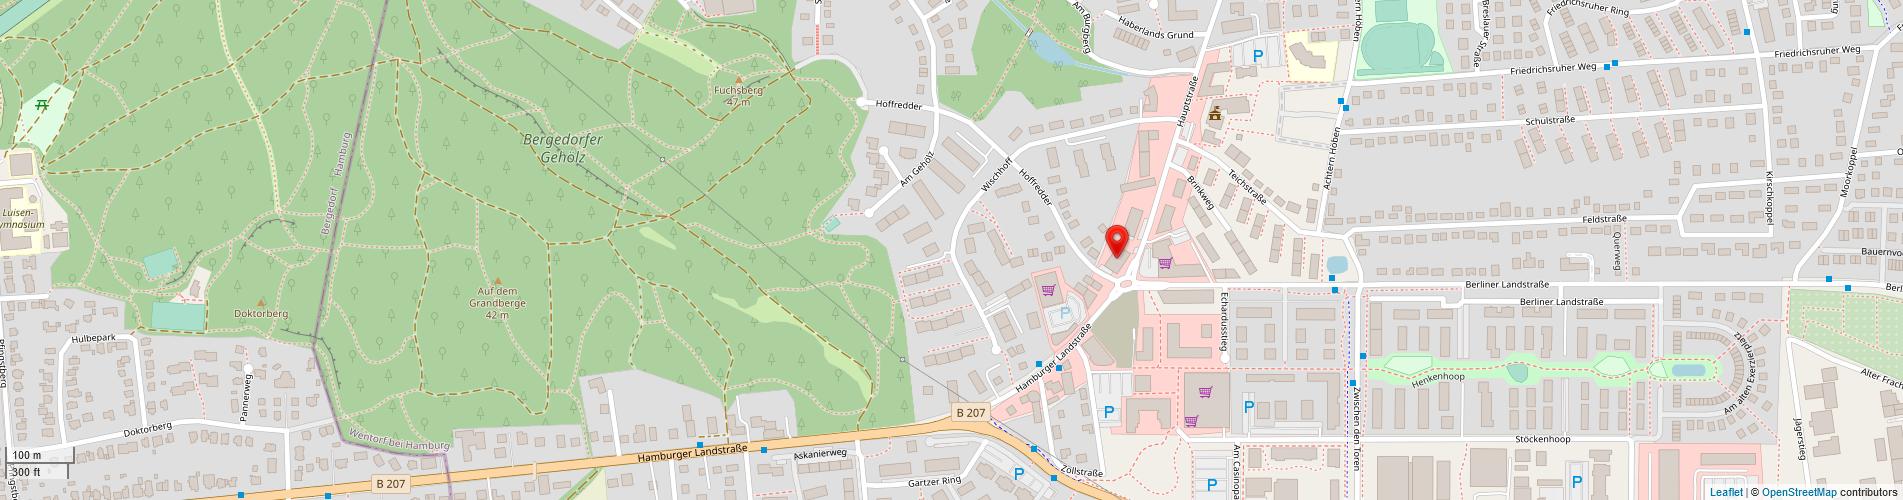 Purrucker OpenStreetMap